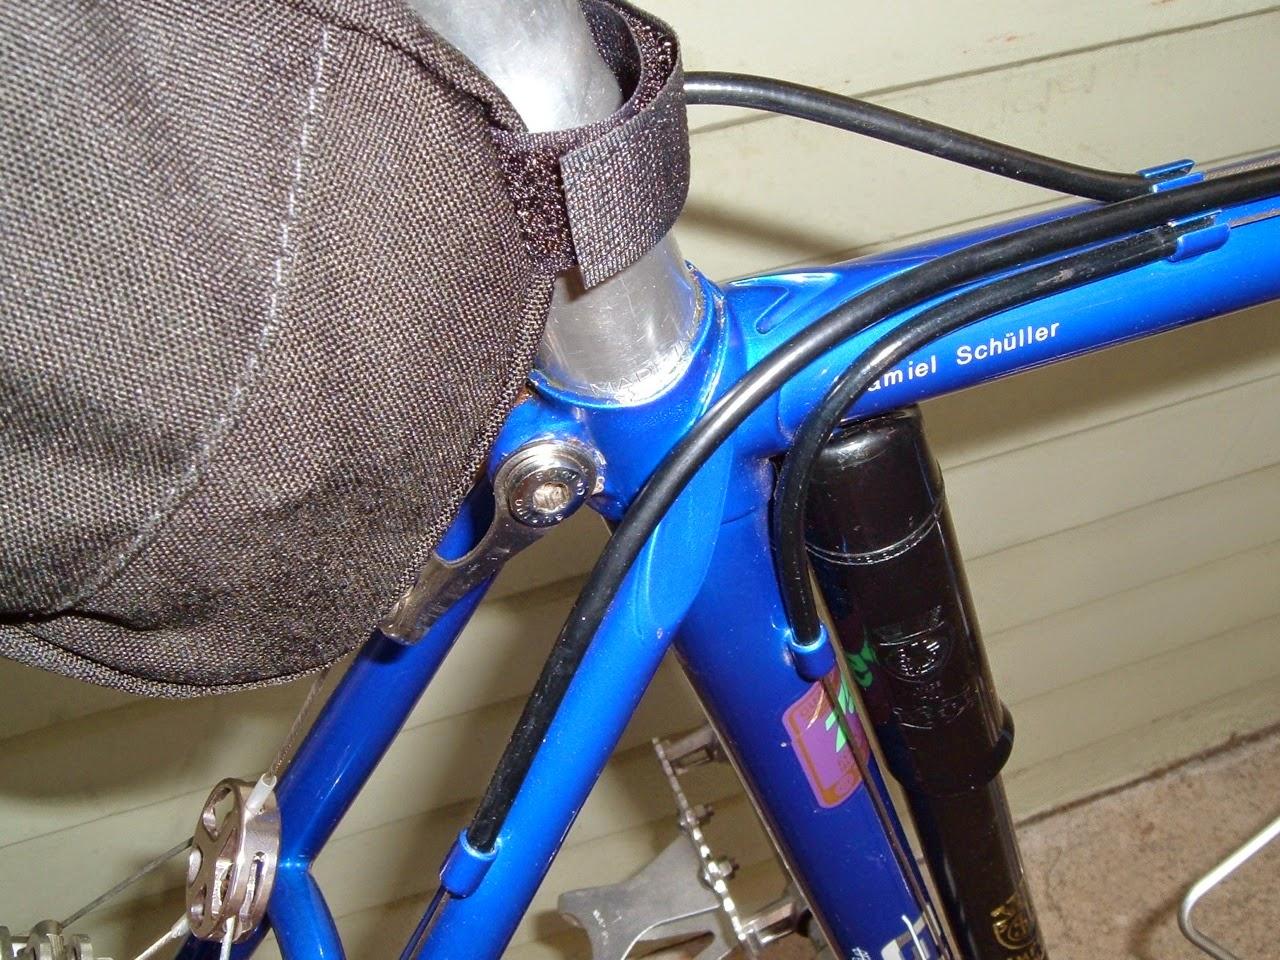 lle cyclocross bike, bicycle, build, Jonsan, Holland, Netherlands, Dutch, California